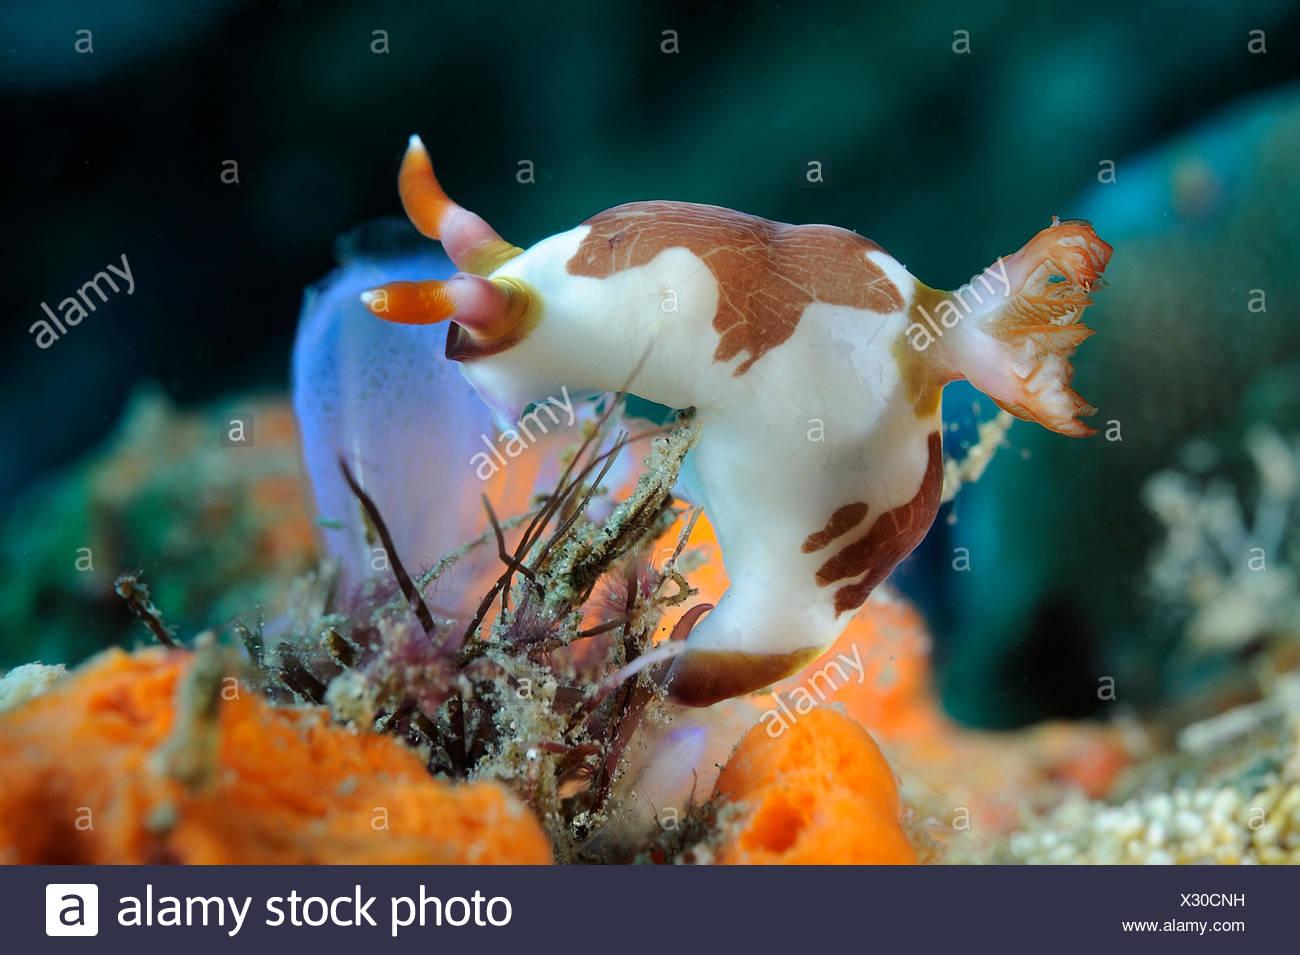 The Nembrotha rutilans is a beautiful slug from Sulawesi - Stock Image